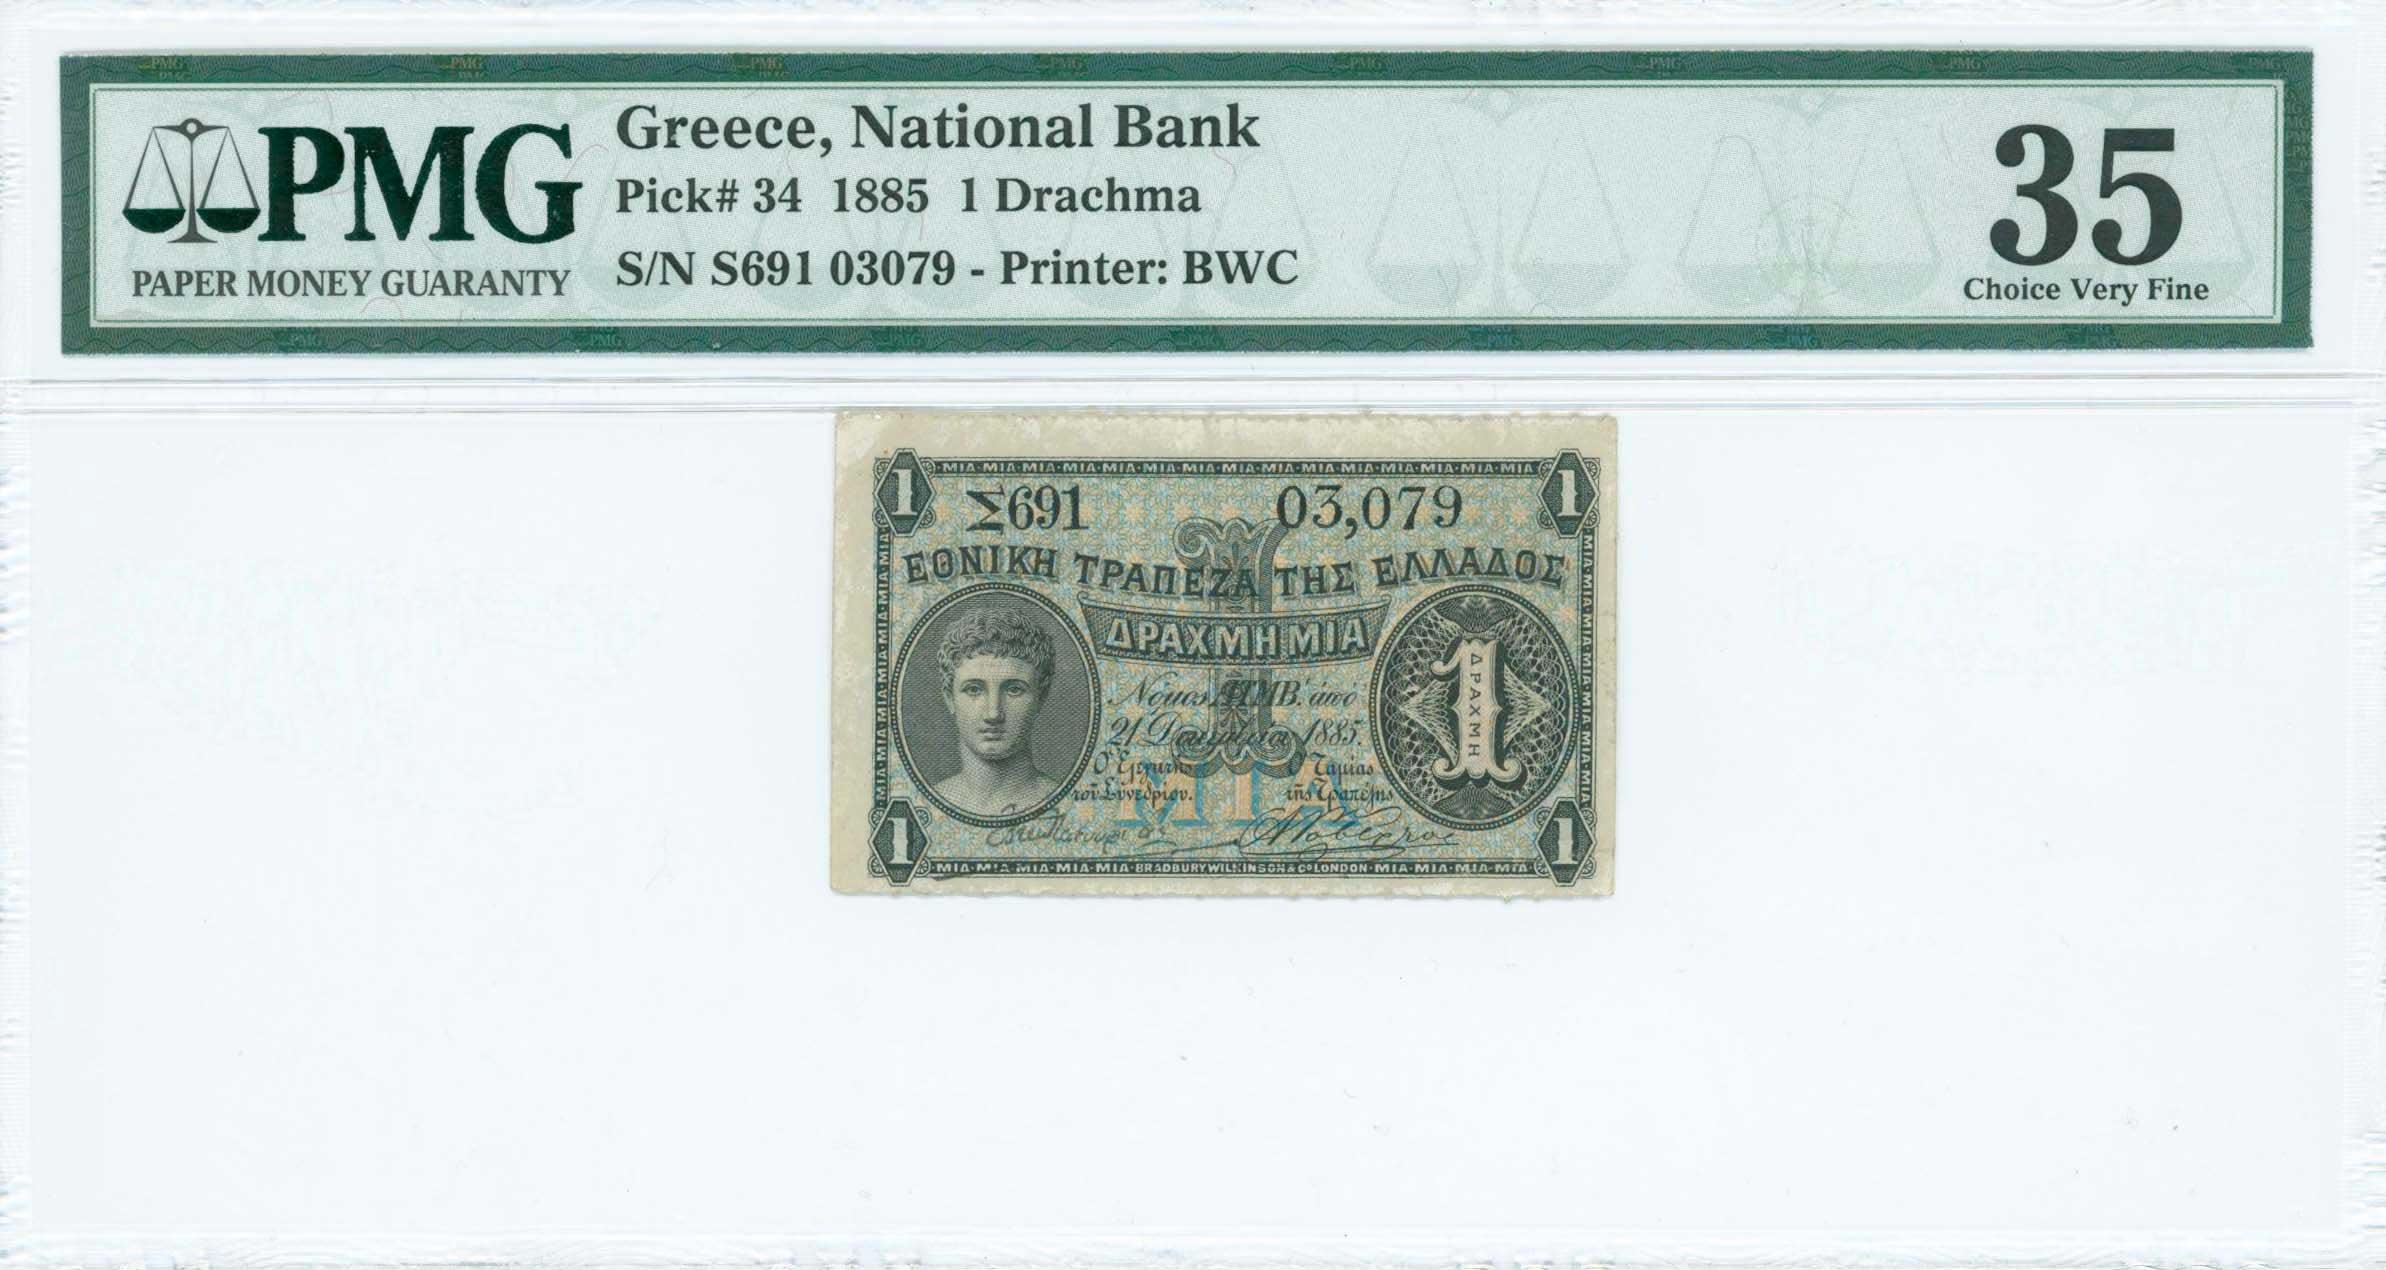 Lot 8420 - -  PAPER MONEY - BANKNOTES National Bank of Greece -  A. Karamitsos Public & Live Bid Auction 644 Coins, Medals & Banknotes